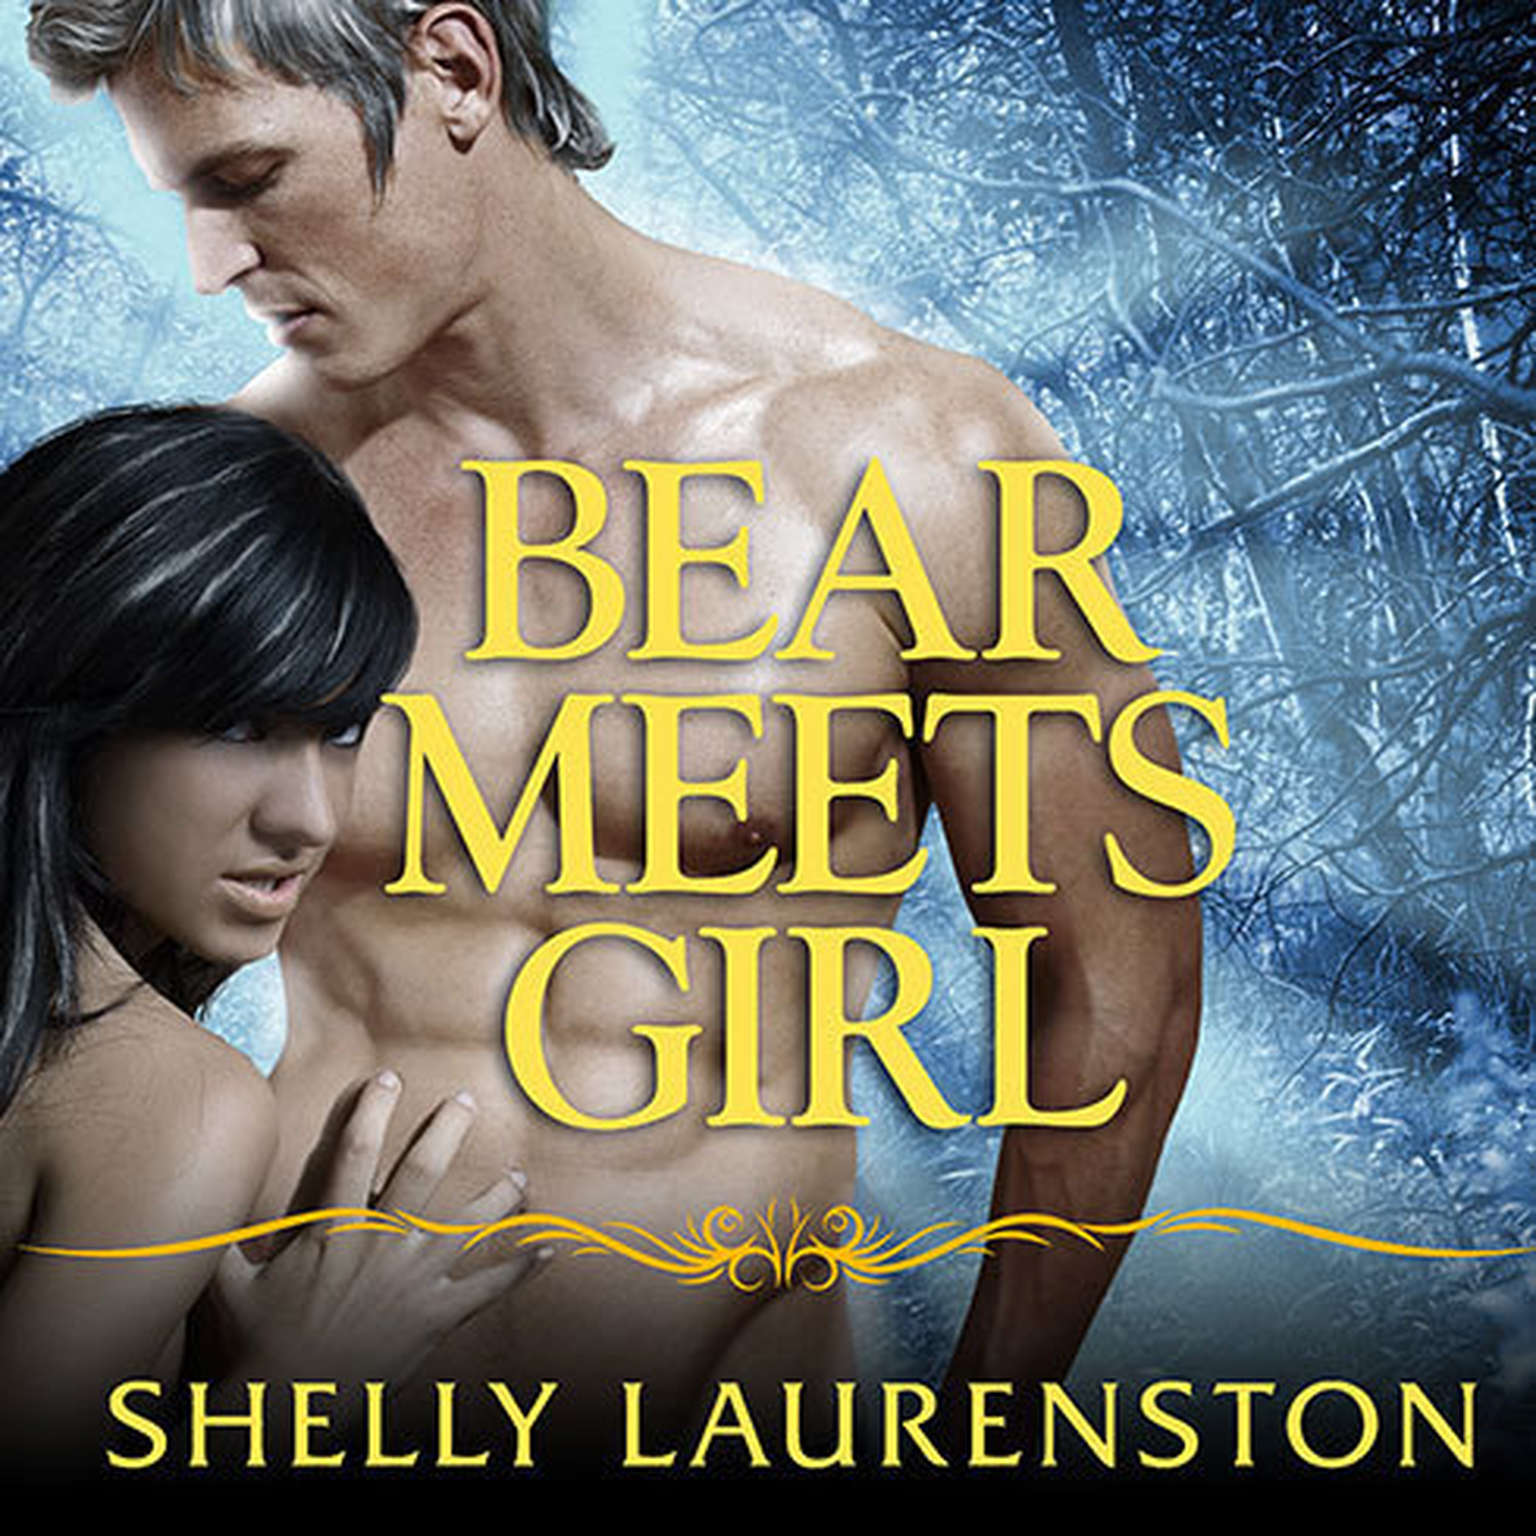 Printable Bear Meets Girl Audiobook Cover Art